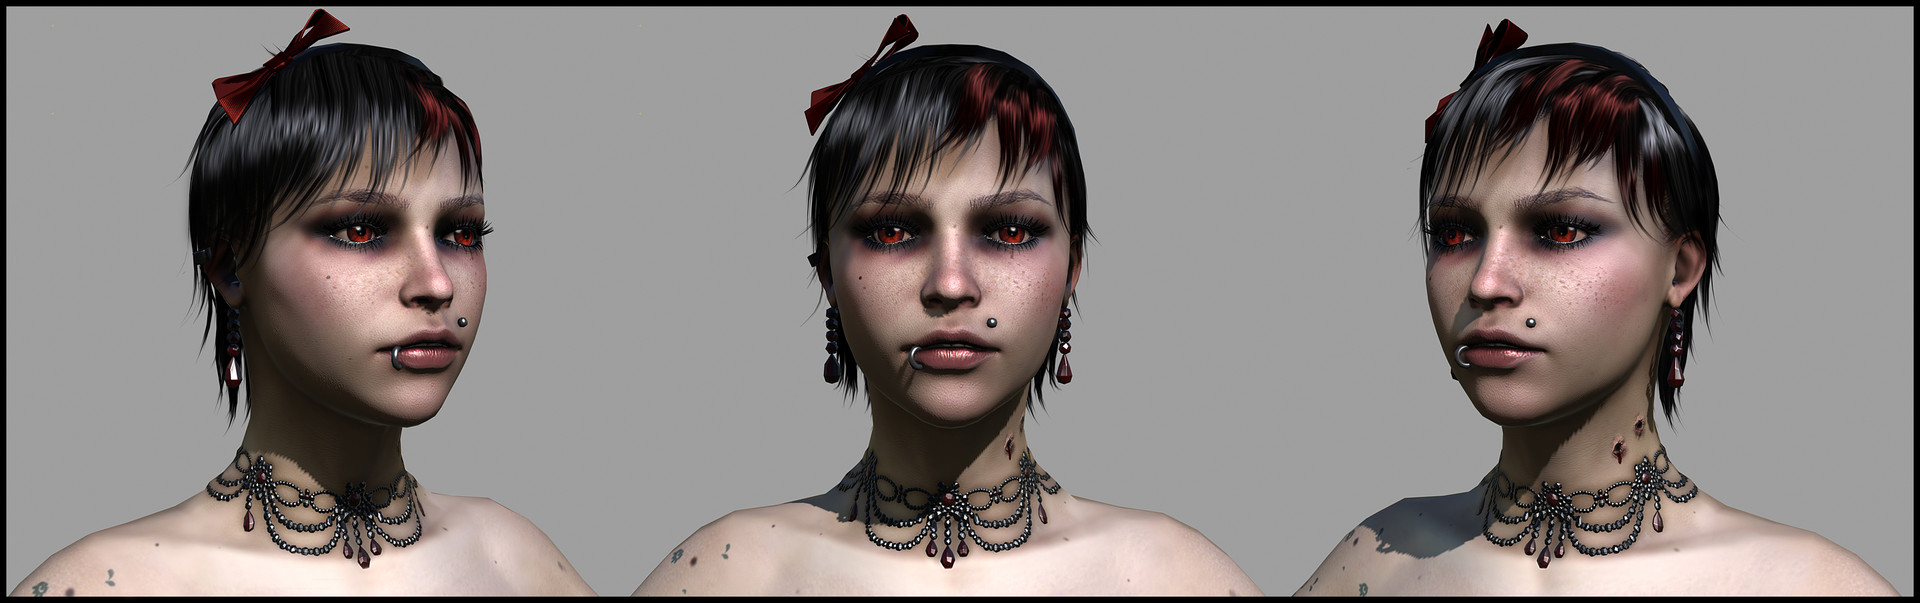 Sam chester samchester vampiricburlesque headorthos